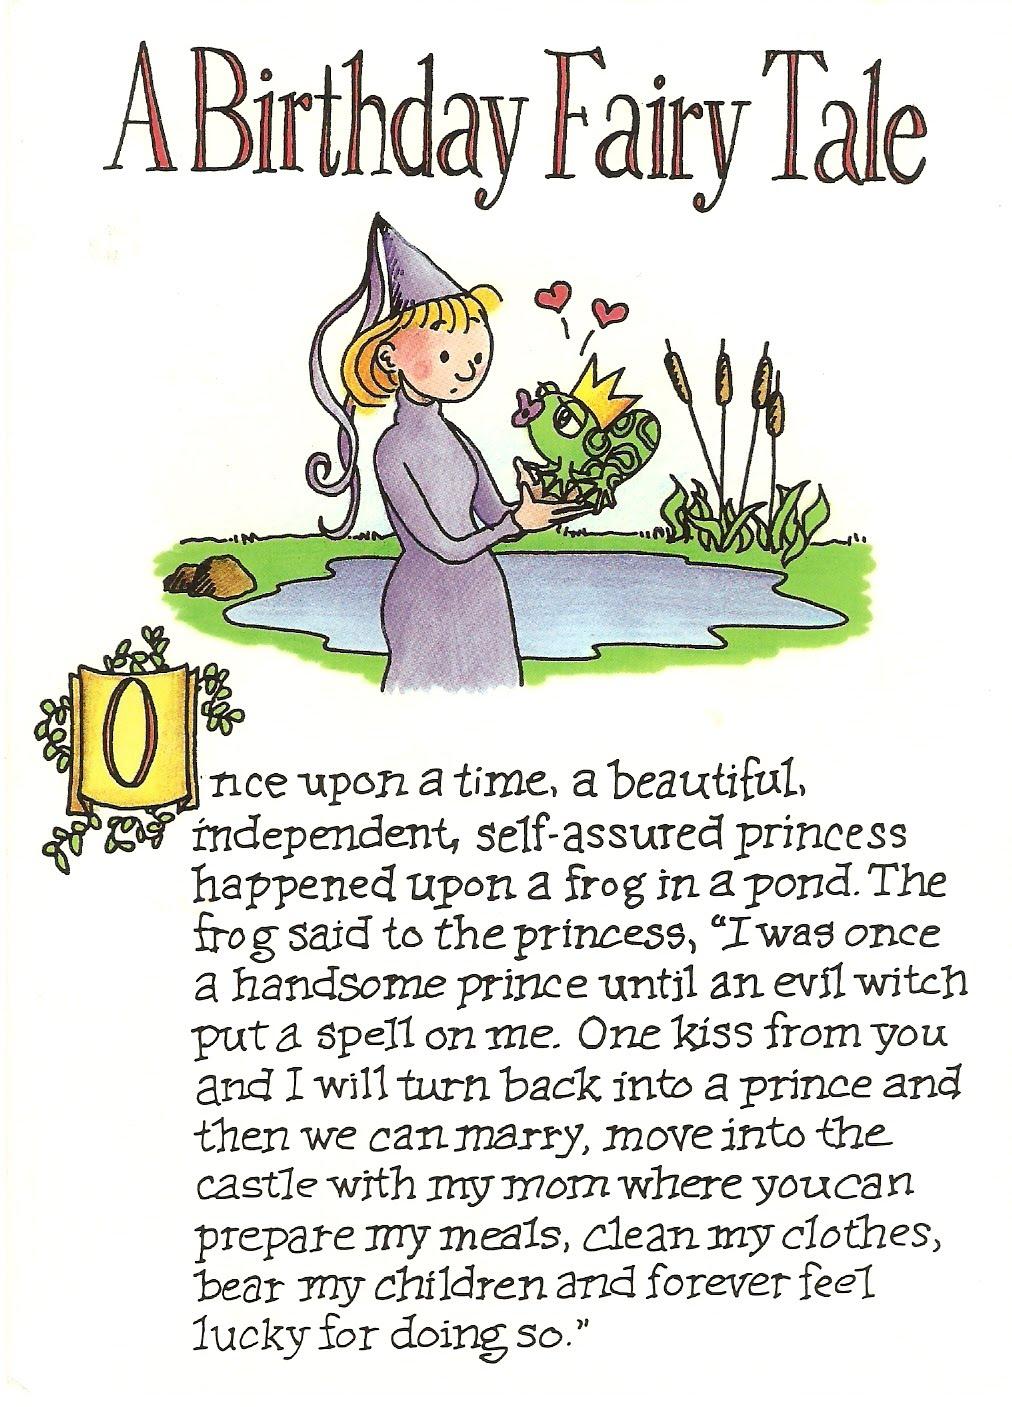 am postscript A Birthday Fairy Tale – The Best Birthday Card Ever